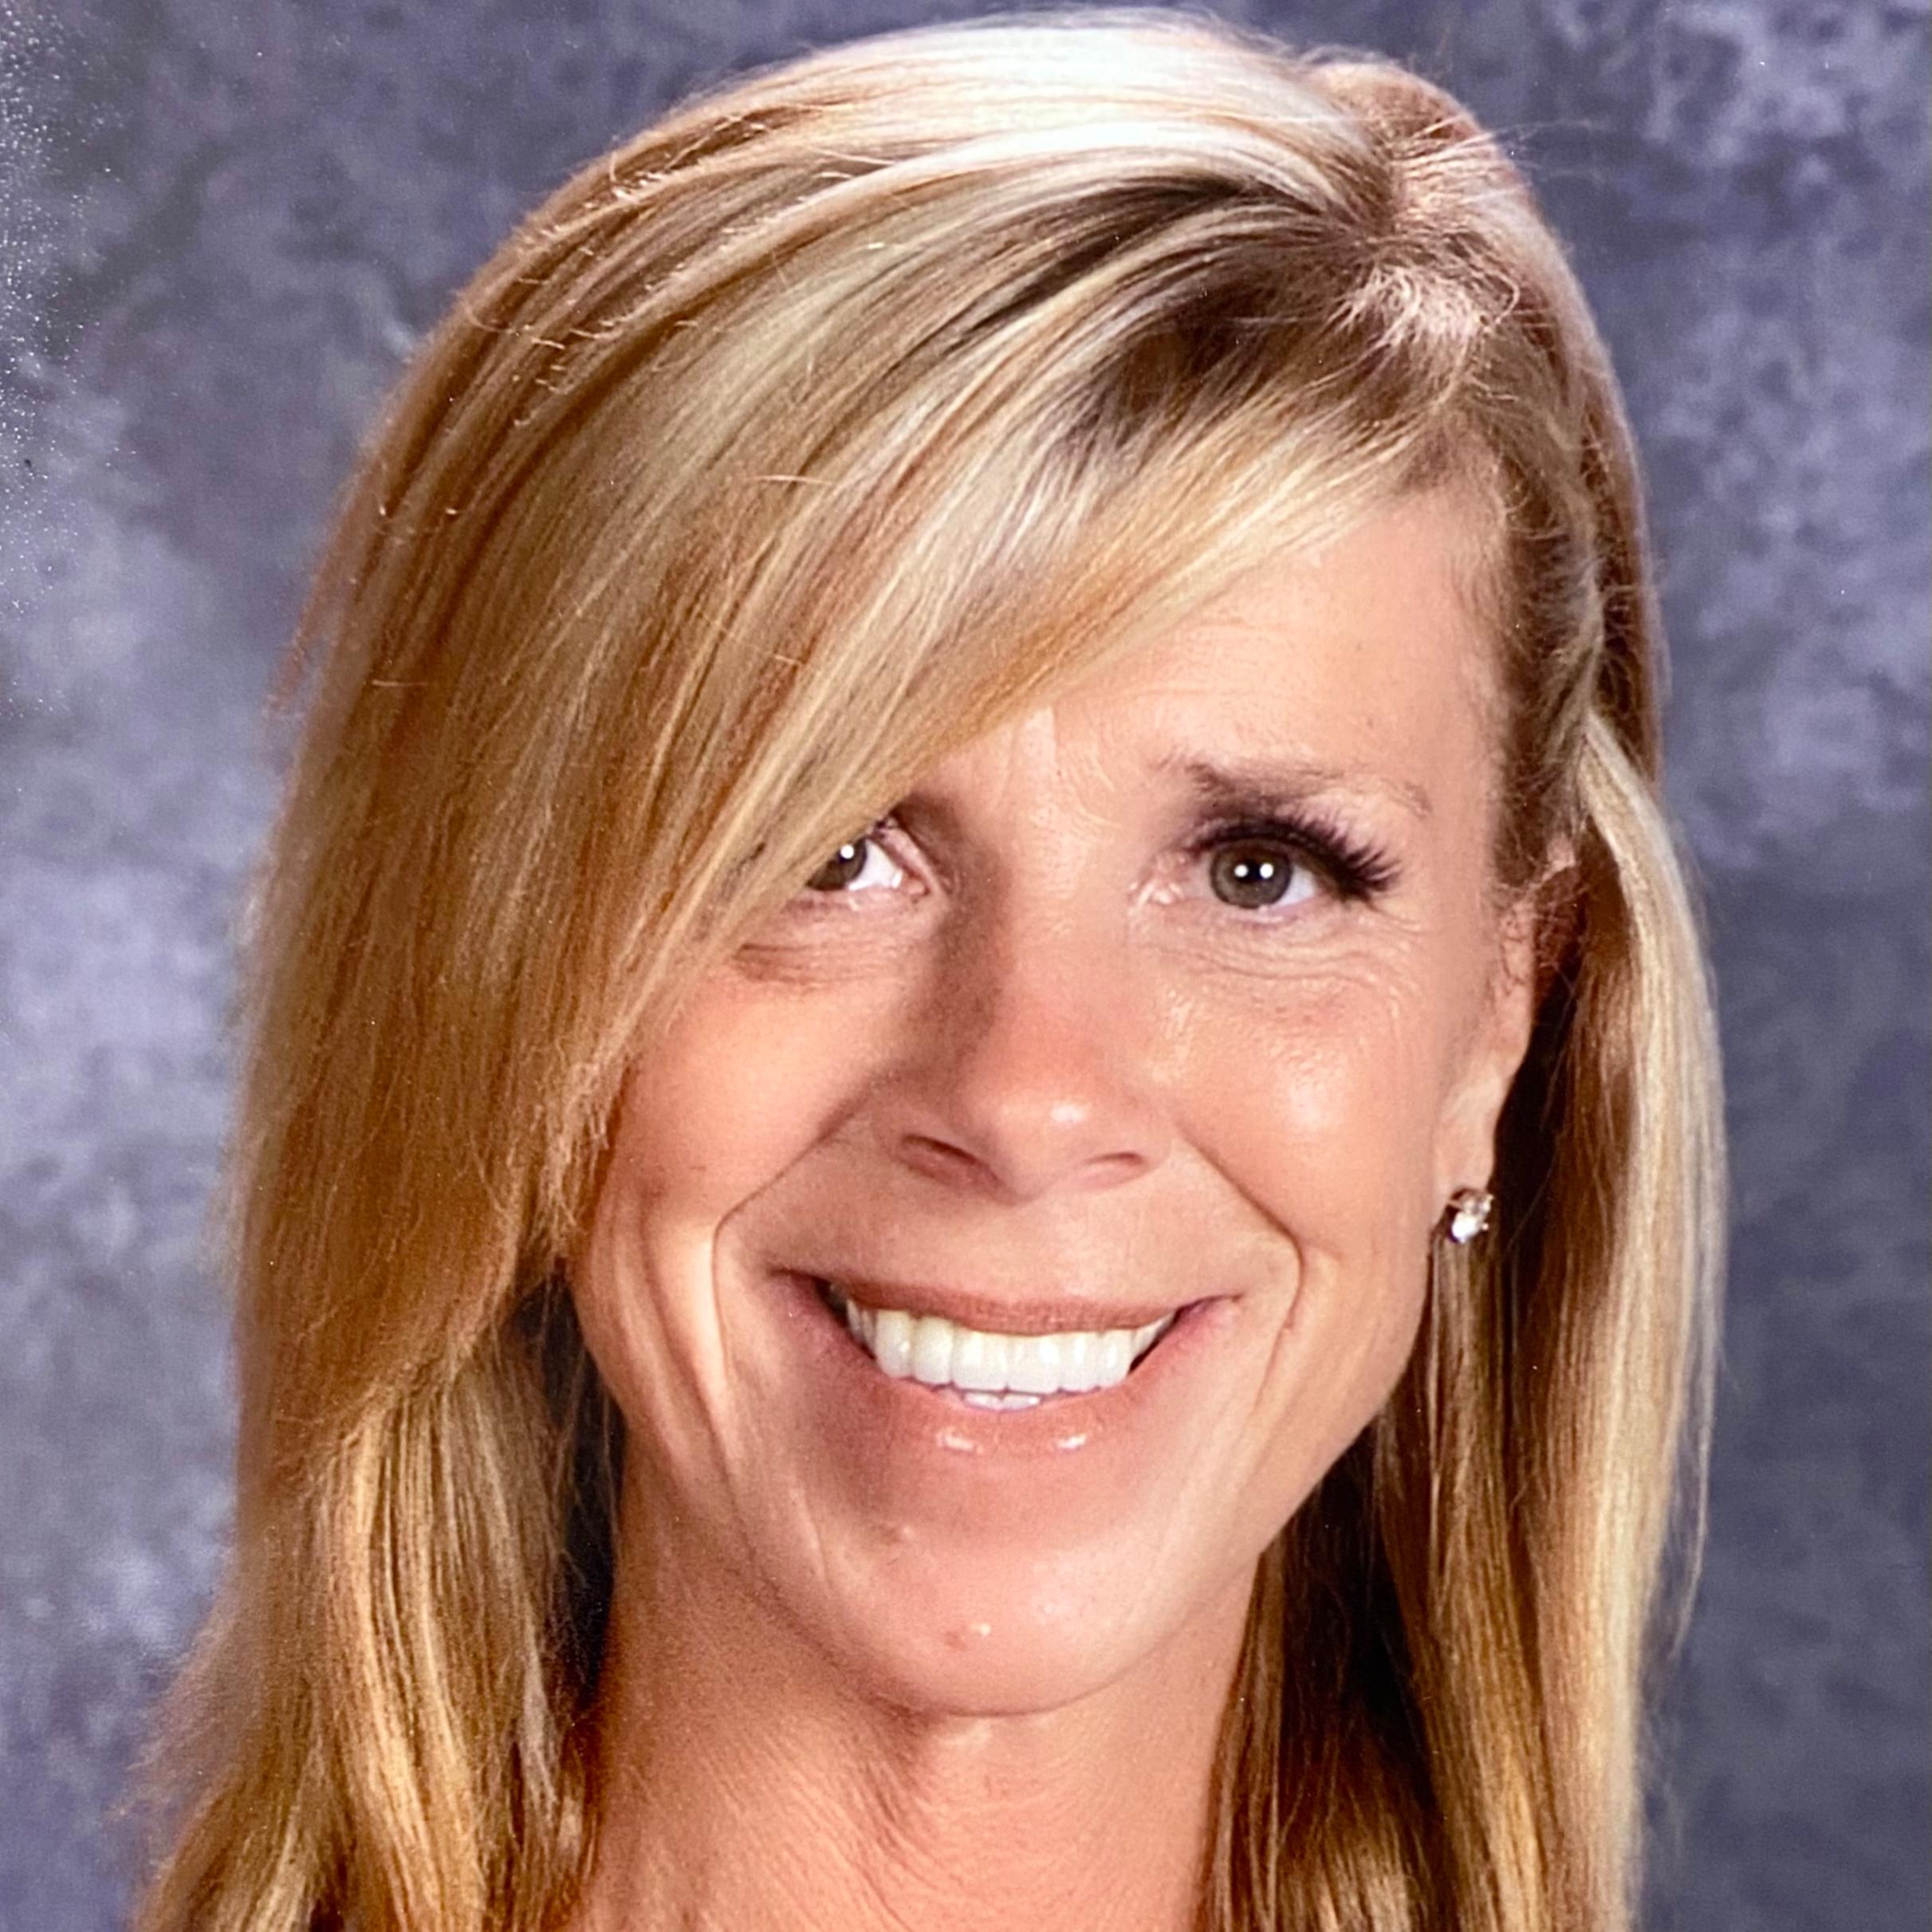 Ms. Douglas